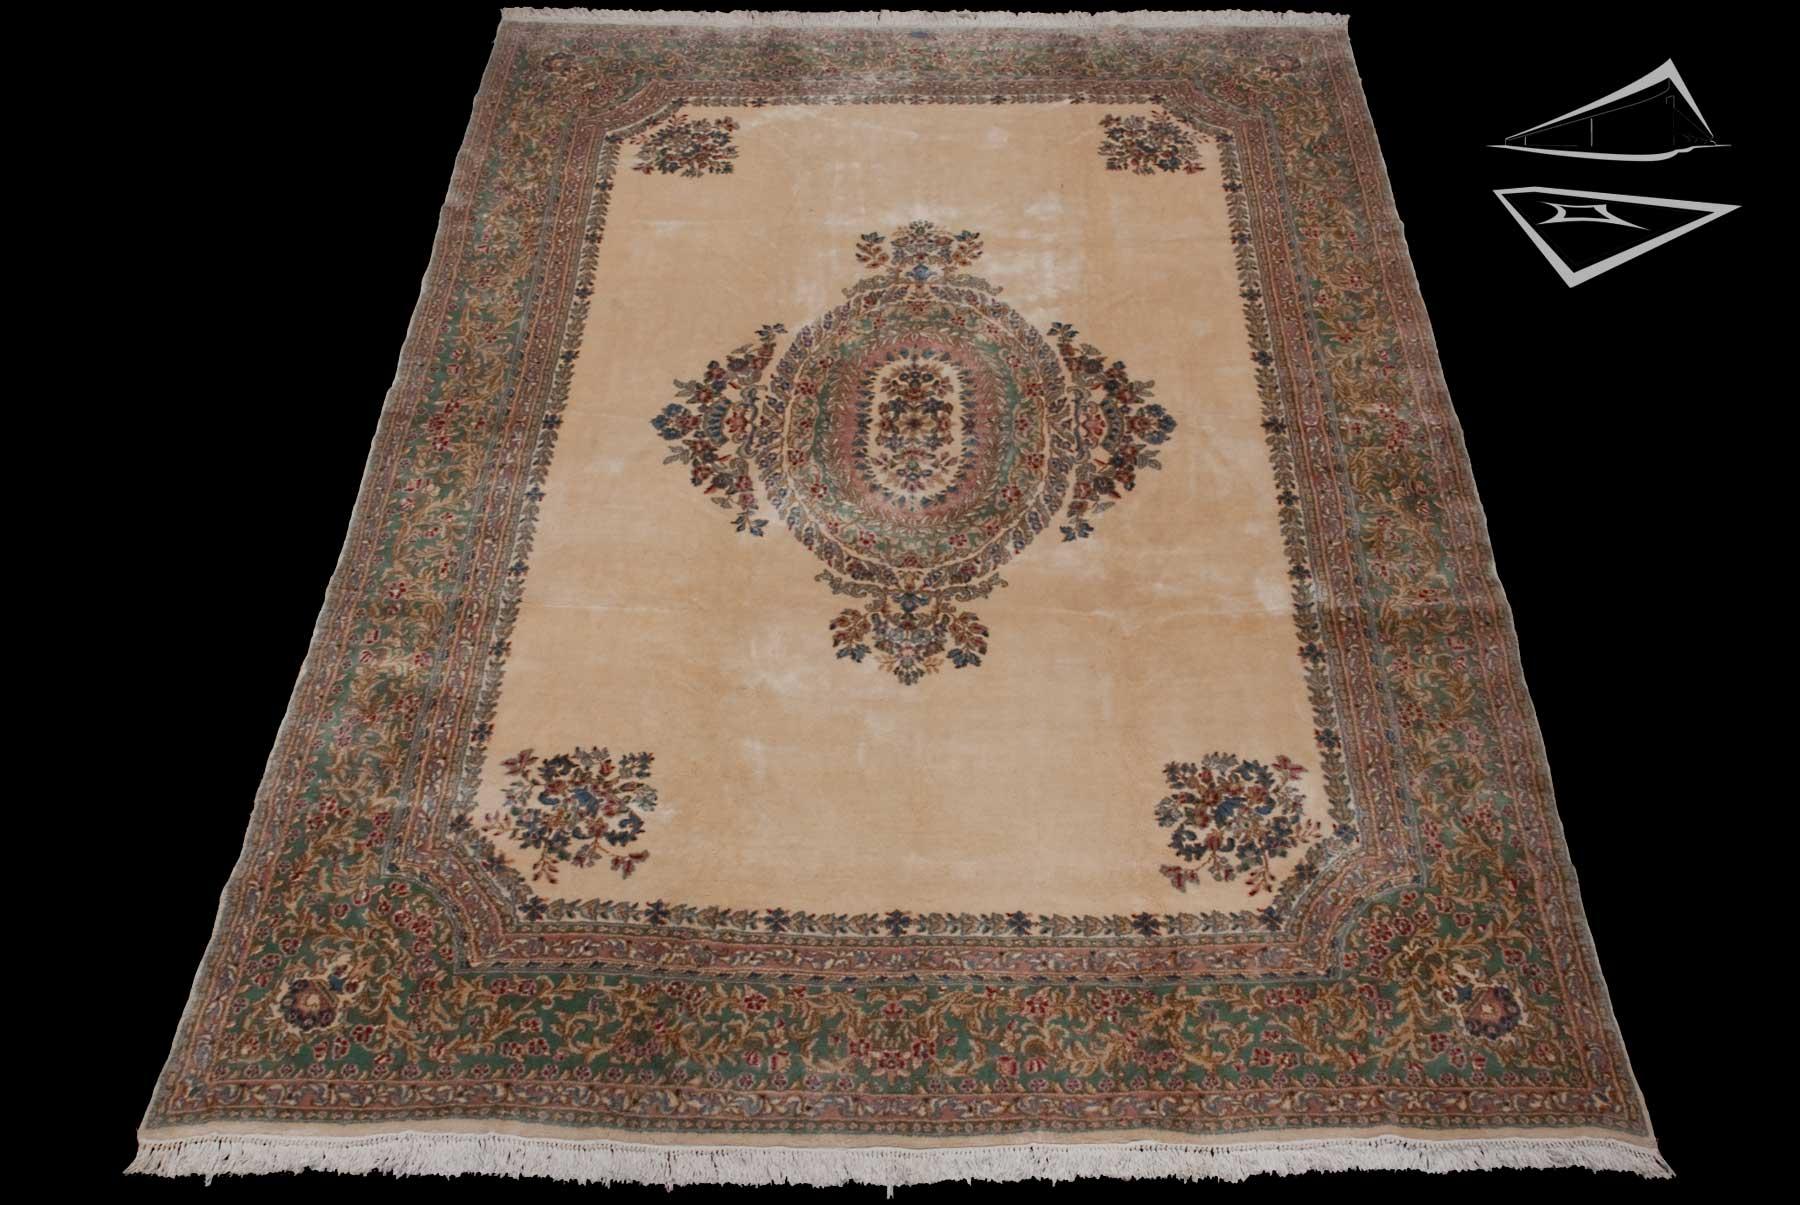 persian kerman rug 10 39 x 15 39. Black Bedroom Furniture Sets. Home Design Ideas